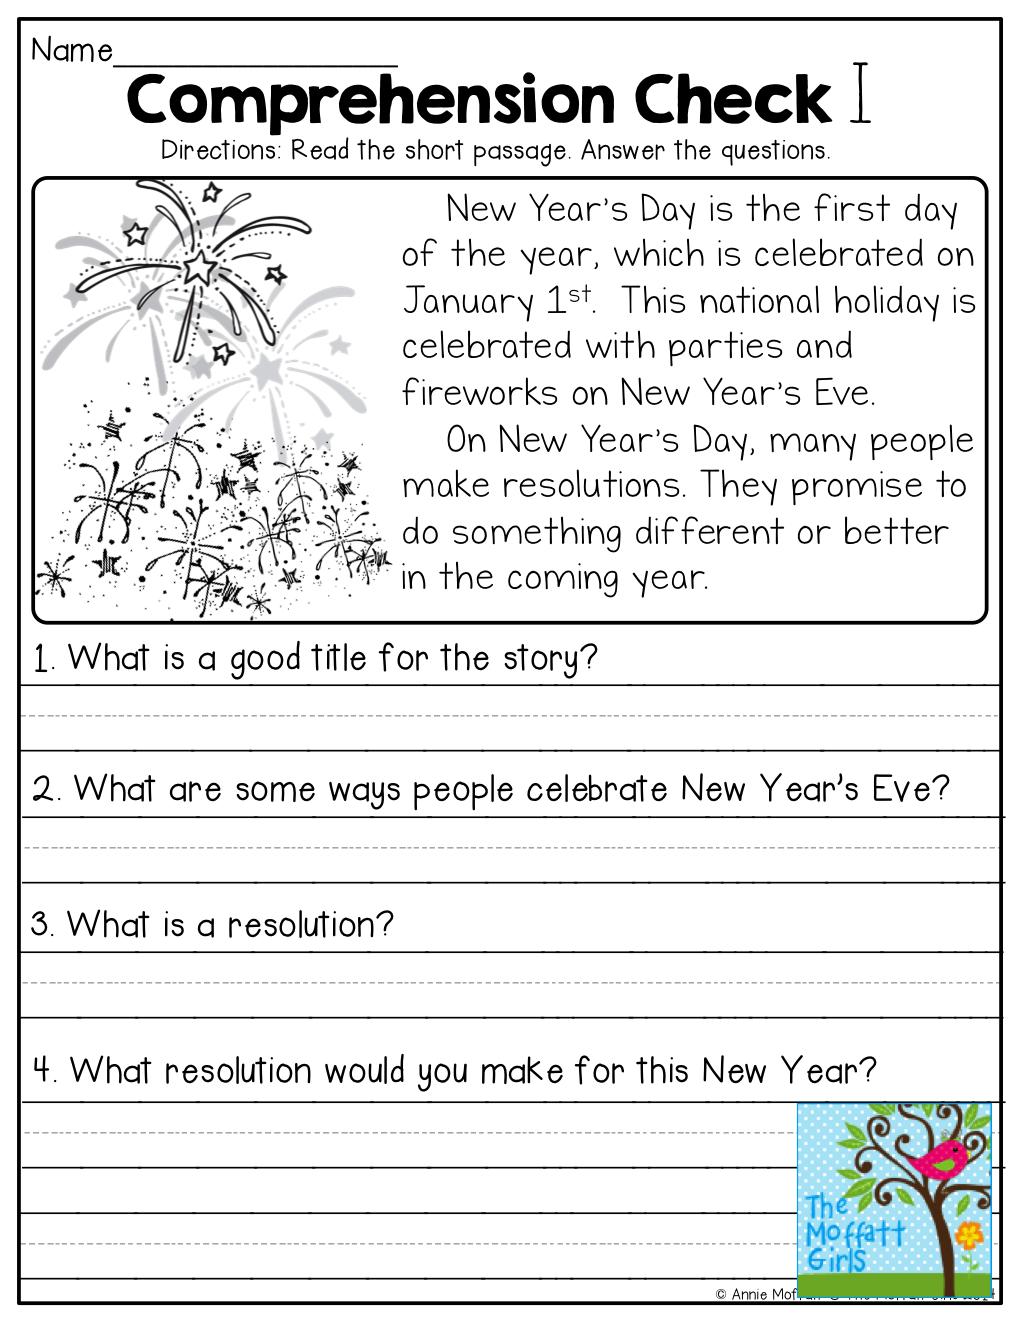 Reading Comprehension Worksheets For Grade 1 | www ...